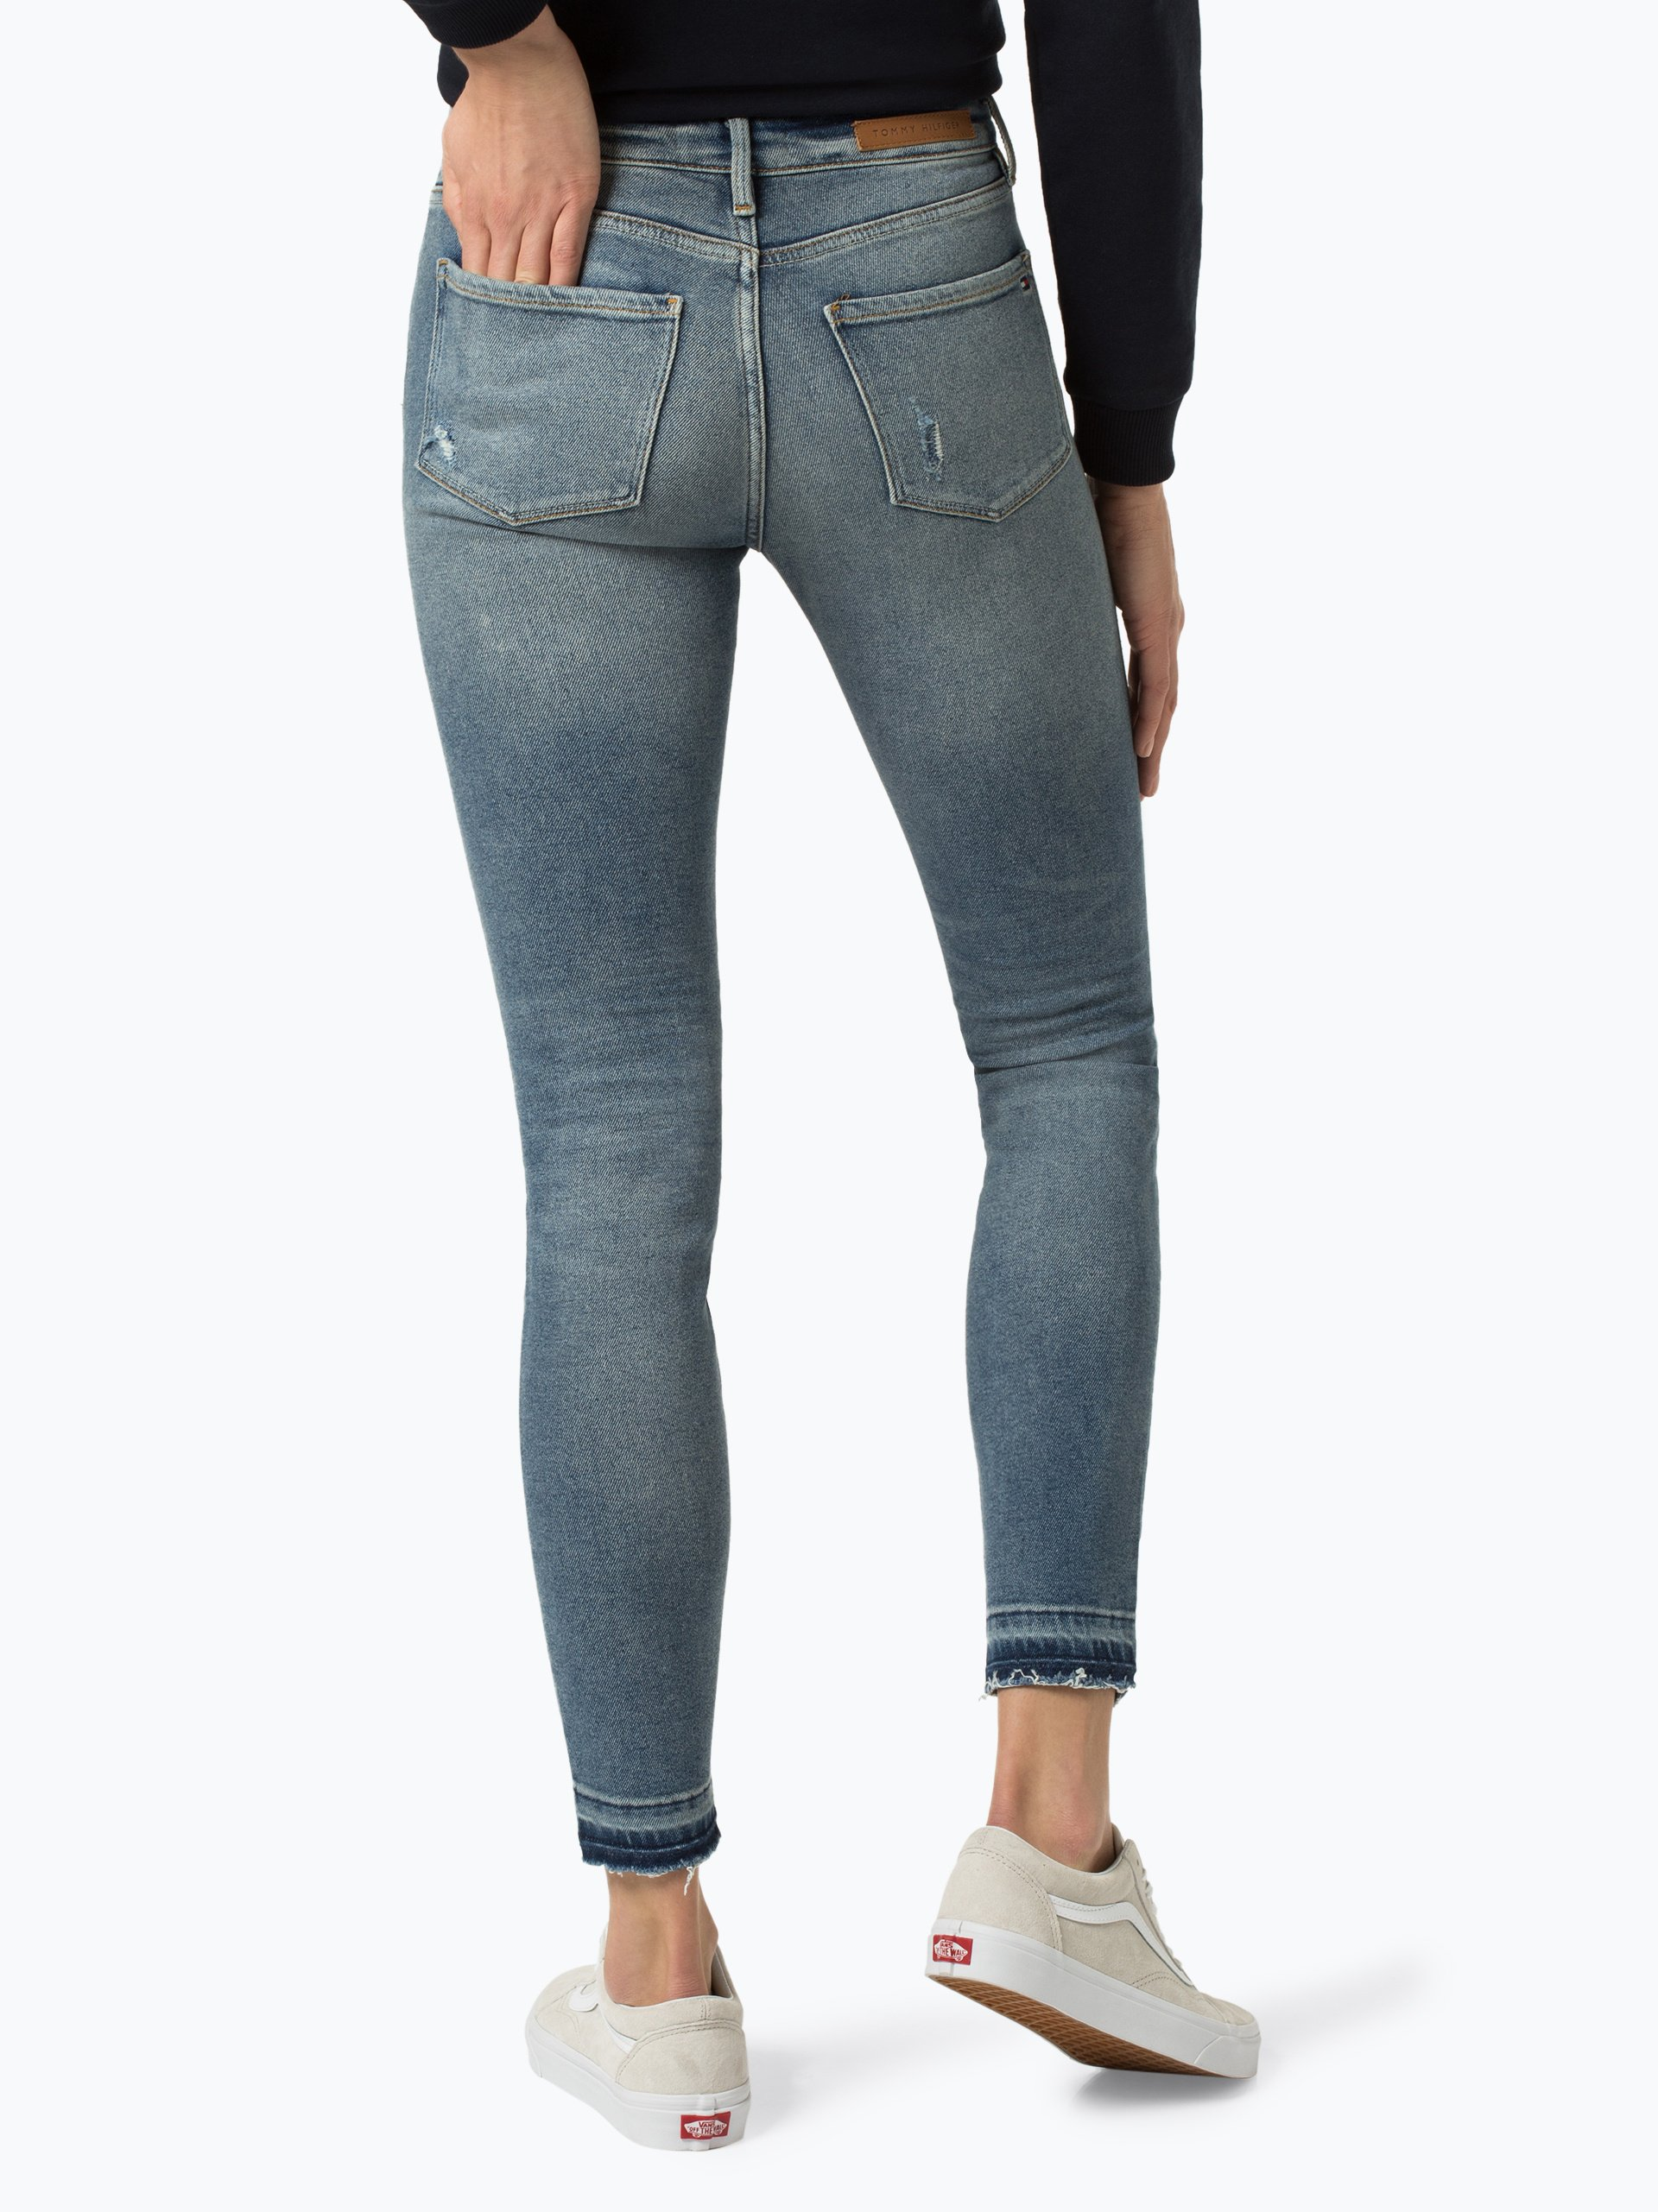 tommy hilfiger damen jeans como online kaufen peek und. Black Bedroom Furniture Sets. Home Design Ideas